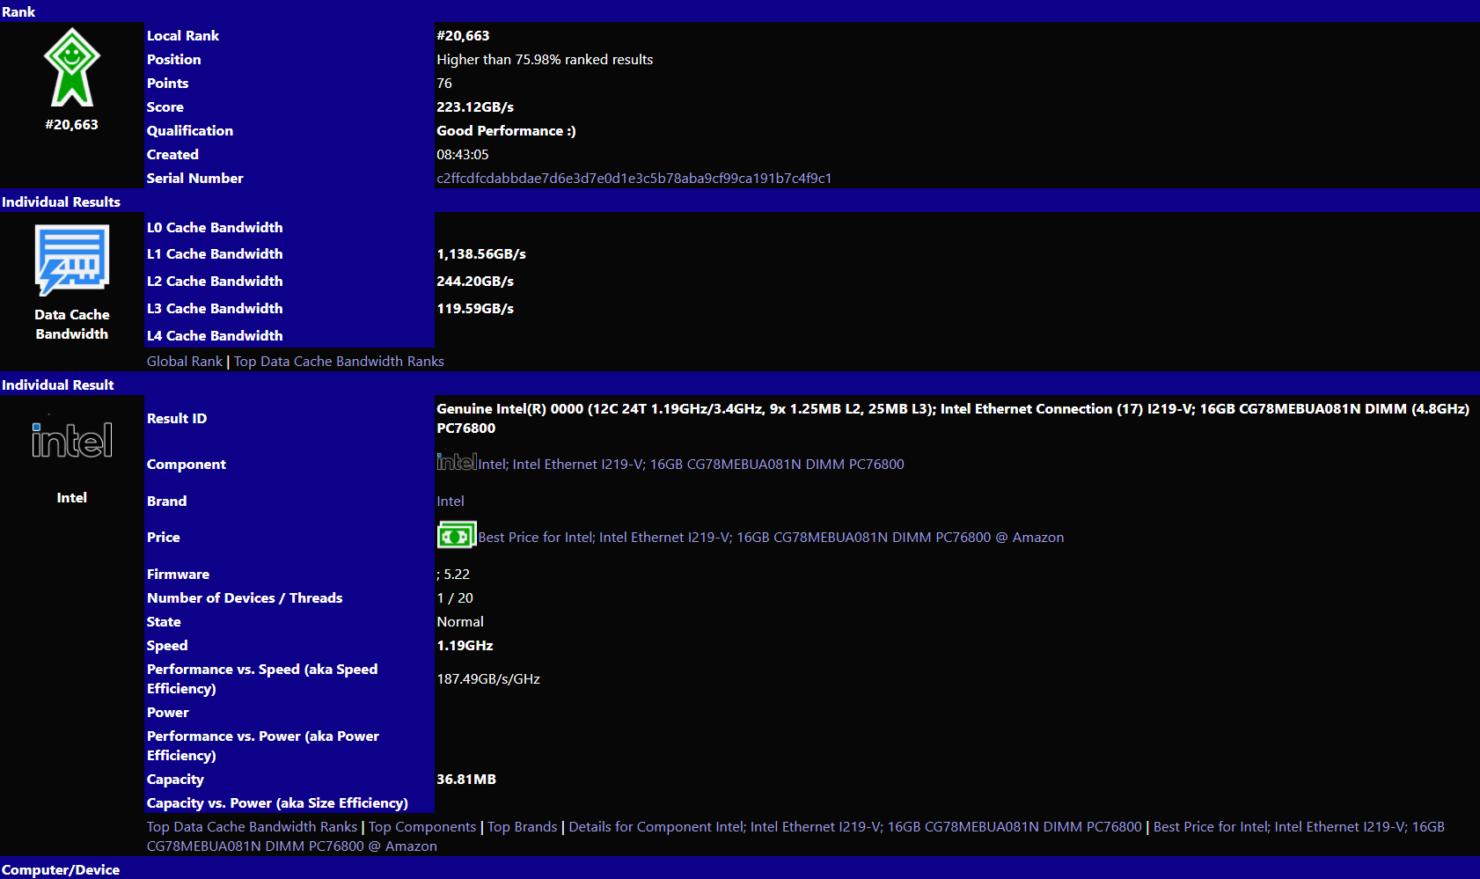 intel-core-i7-12700k-alder-lake-desktop-cpu-sample-_1